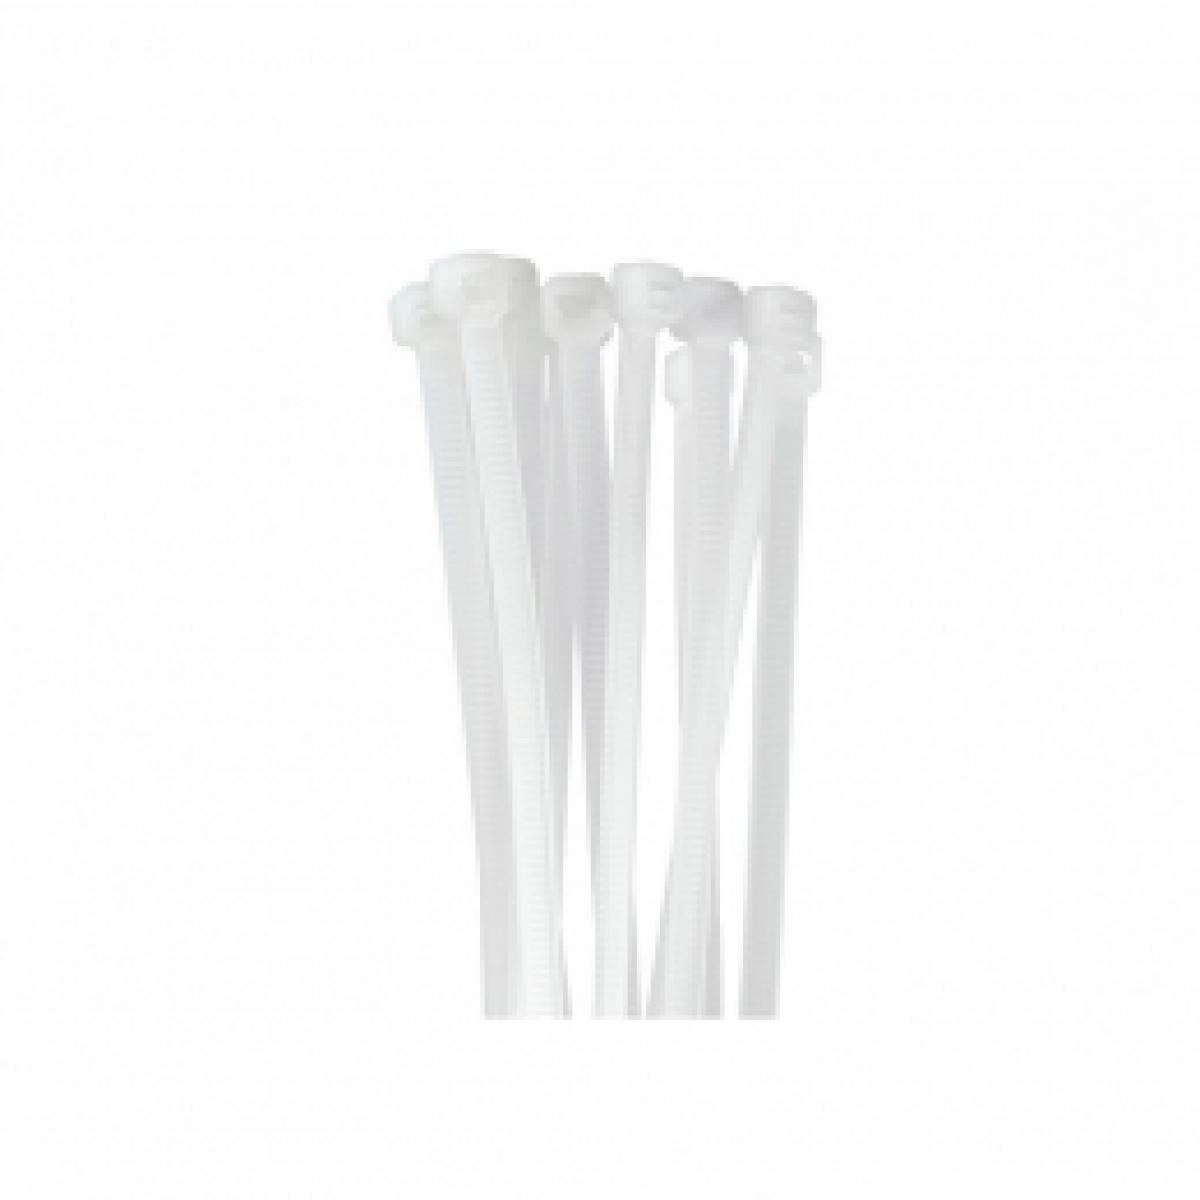 Fascette nylon etelec bianca fb36045